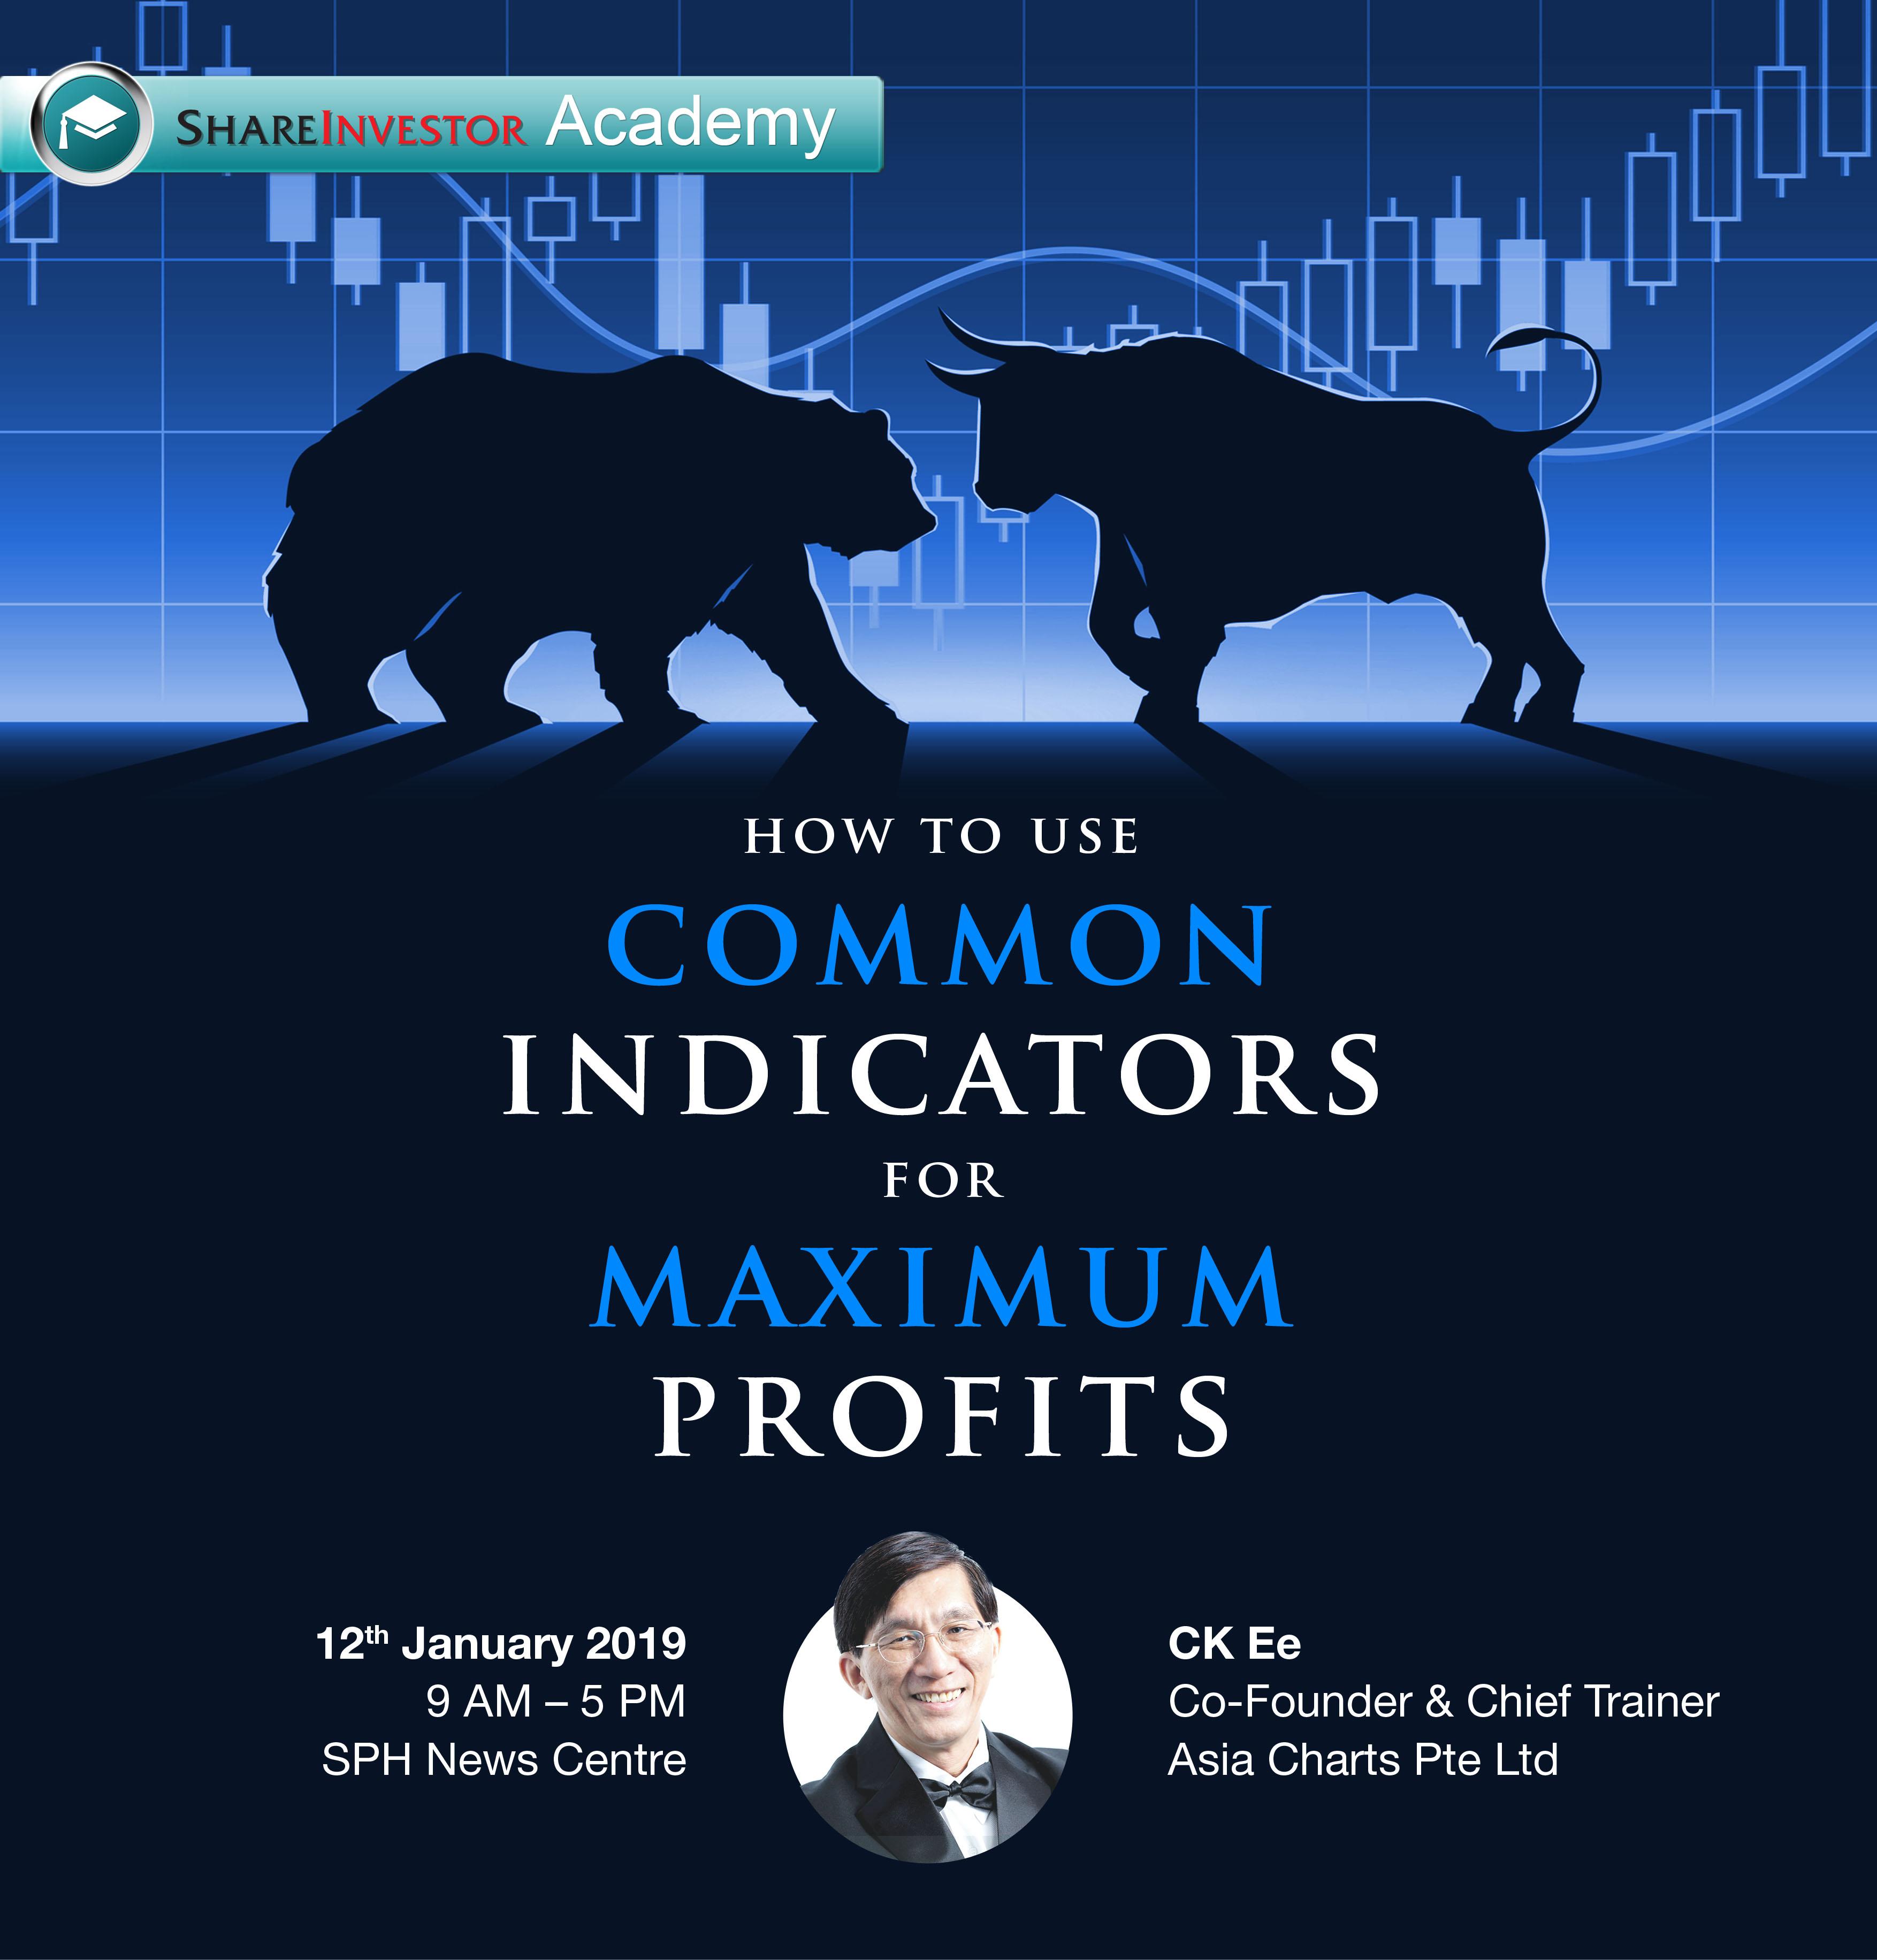 How To Use Common Indicators For Maximum Profits